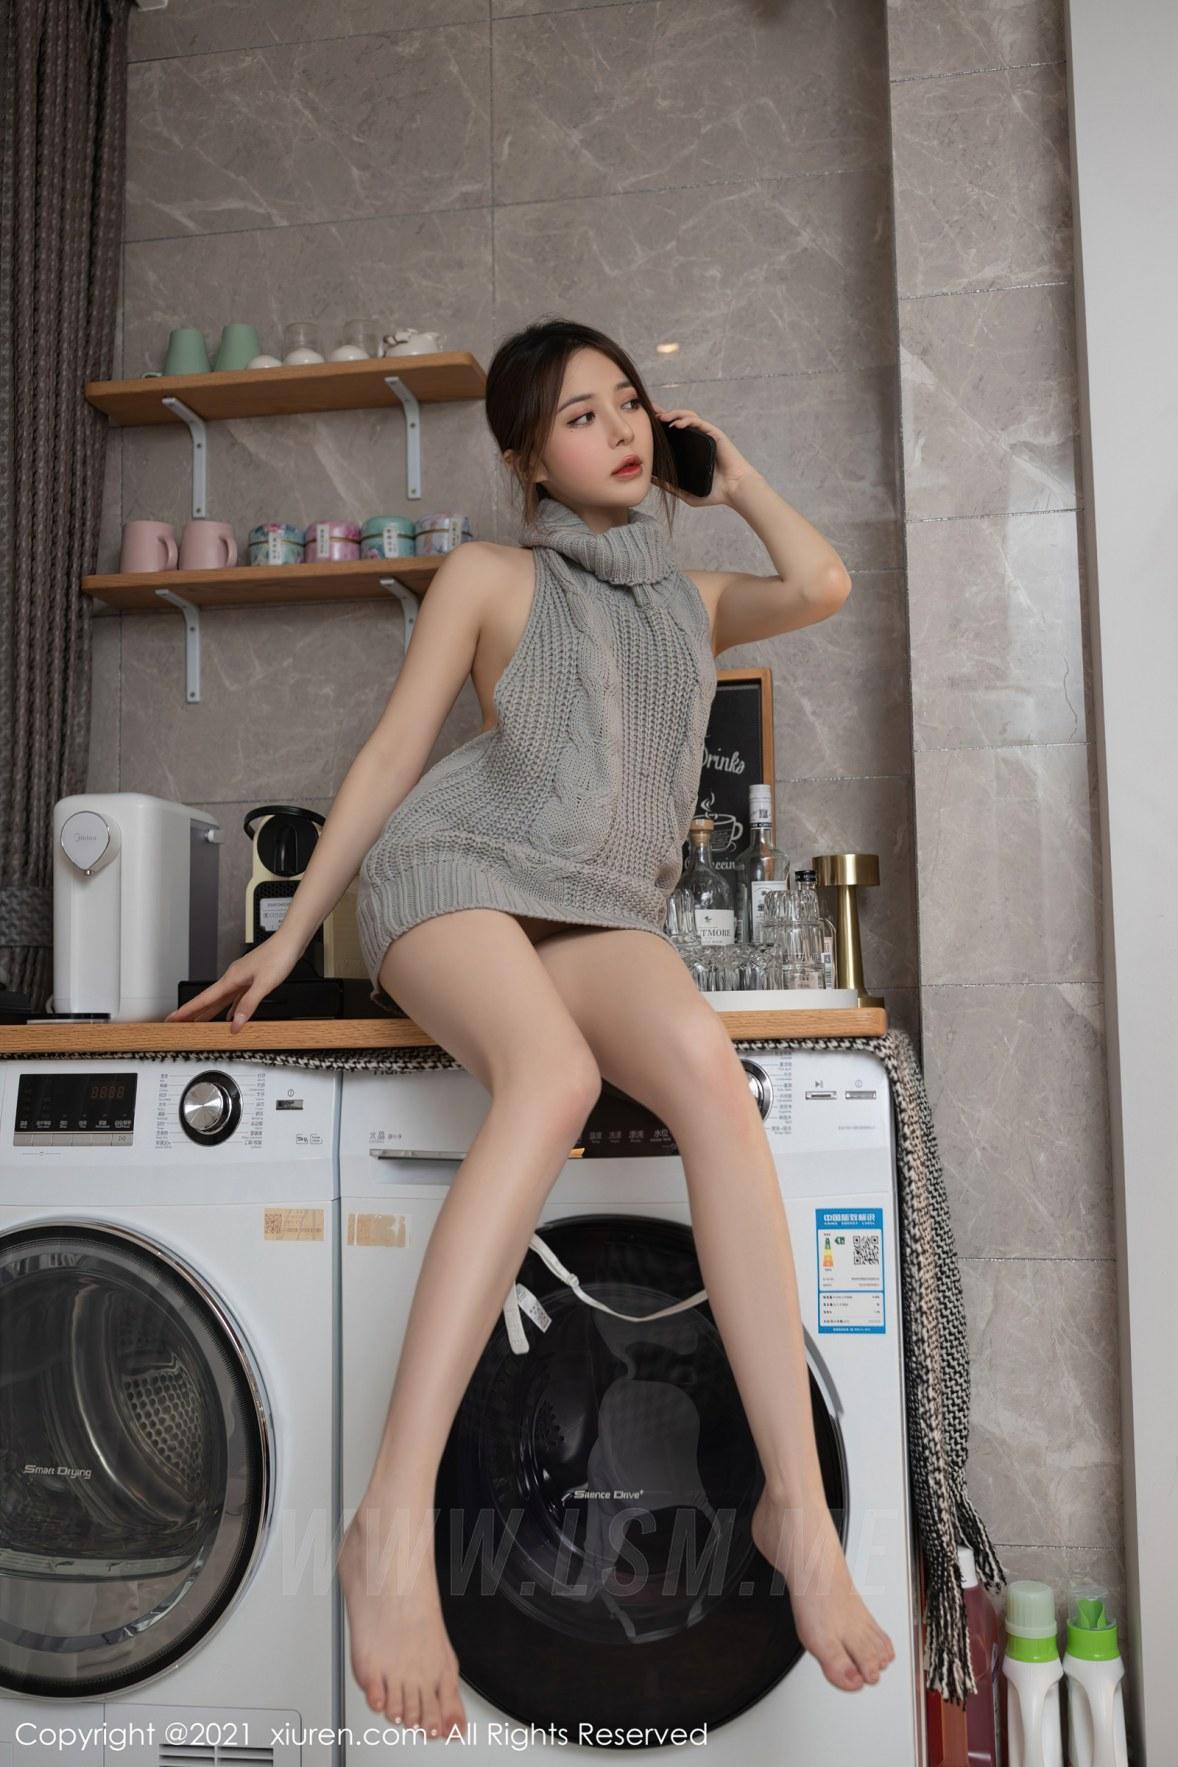 3620 040 4ig 3600 5400 - XiuRen 秀人 No.3620 洗衣机维修主题 鱼子酱Fish 性感写真111 - 秀人网 -【免费在线写真】【丽人丝语】